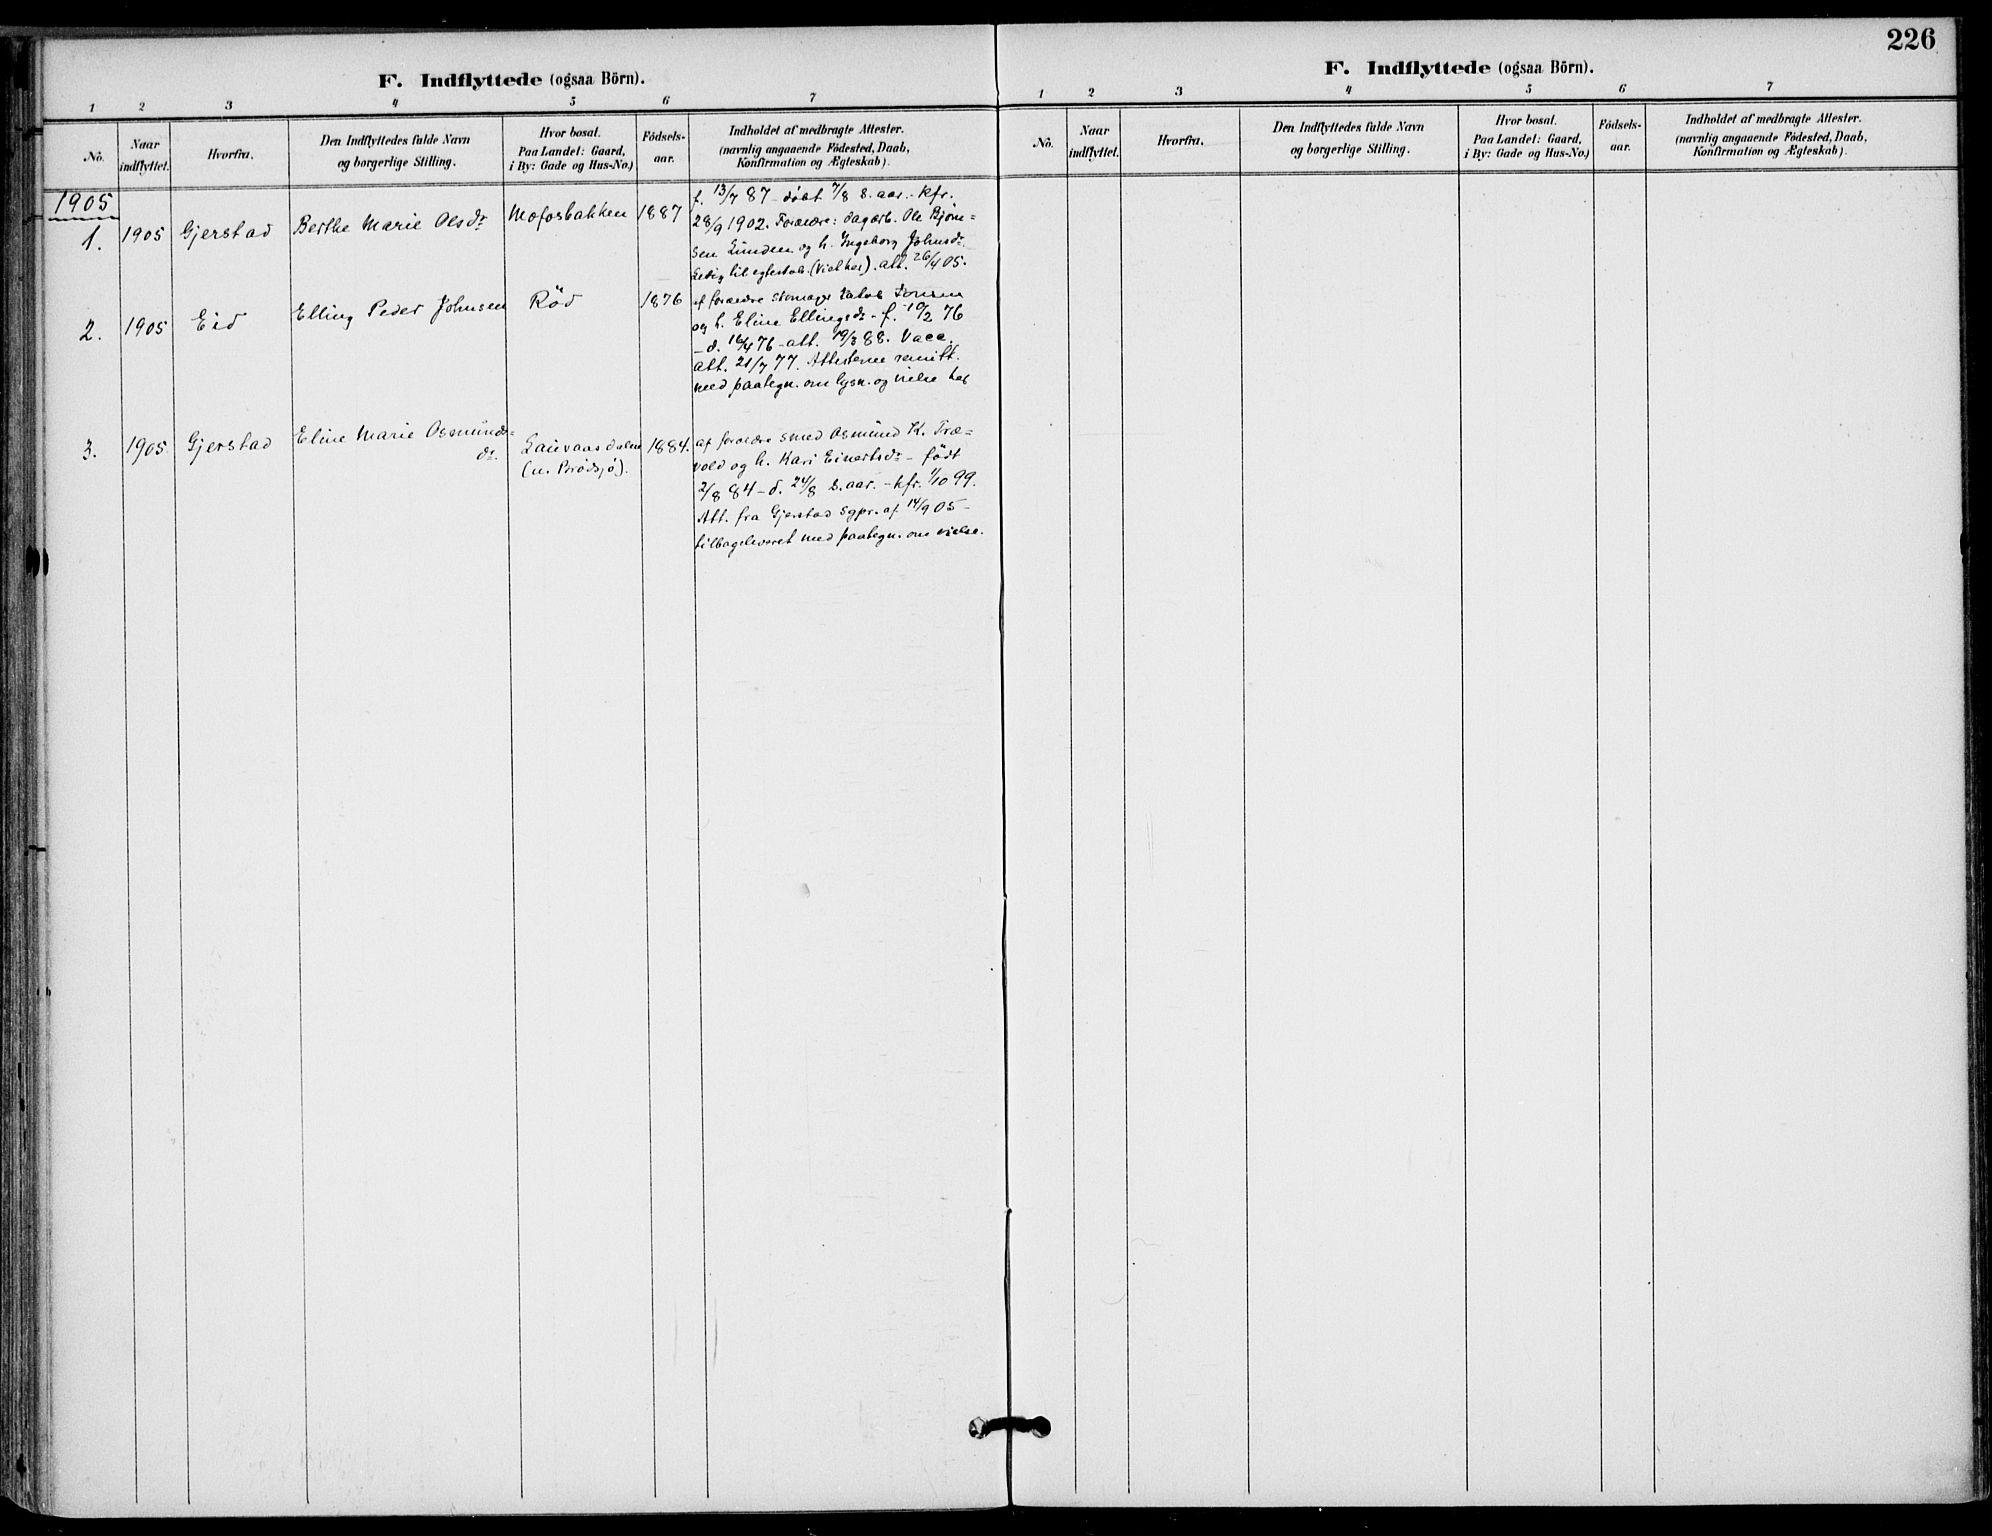 SAKO, Drangedal kirkebøker, F/Fa/L0012: Ministerialbok nr. 12, 1895-1905, s. 226